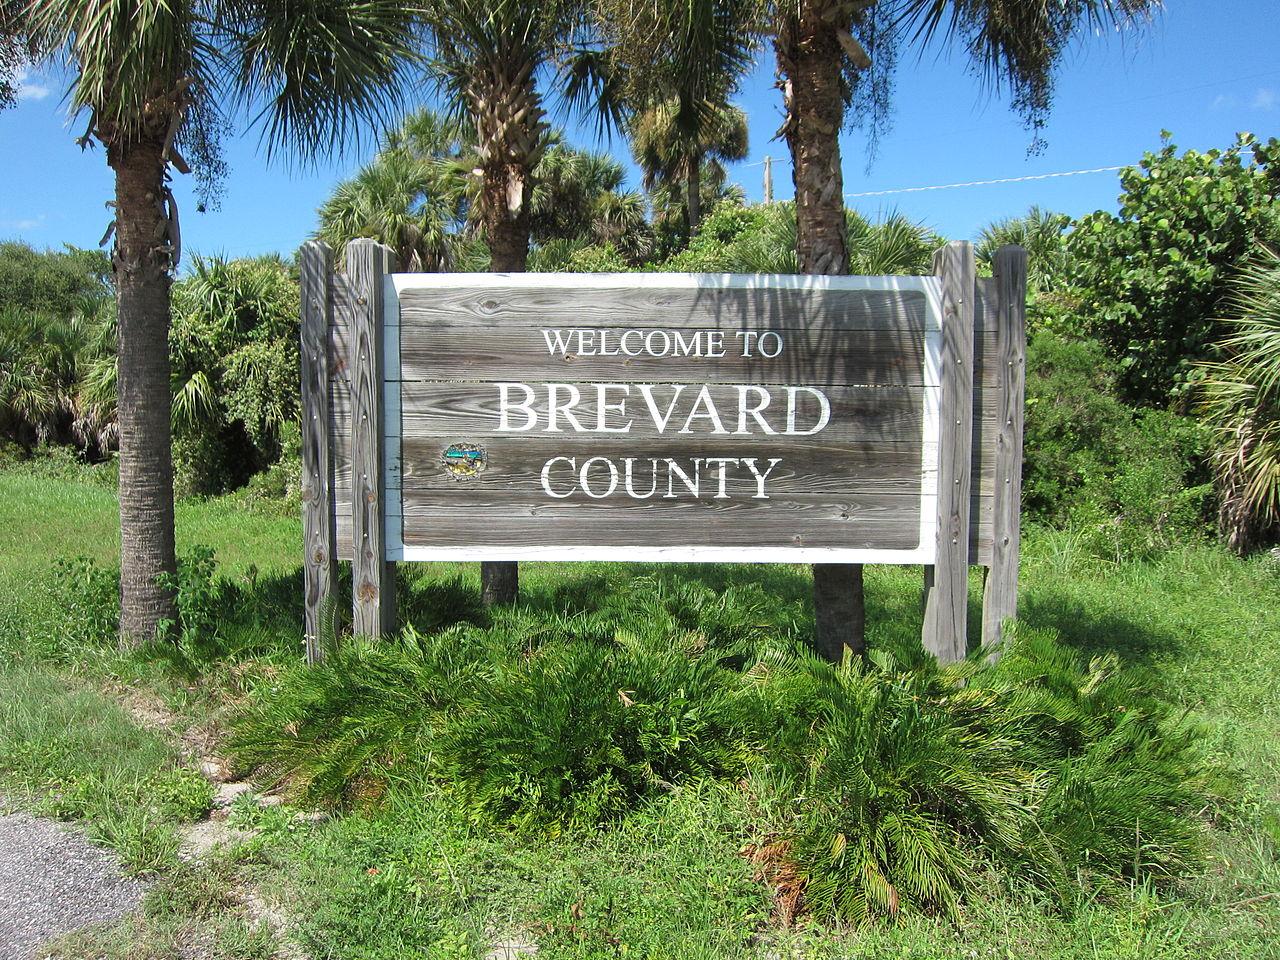 Brevard County Personals Florida (FL) - Online Personals